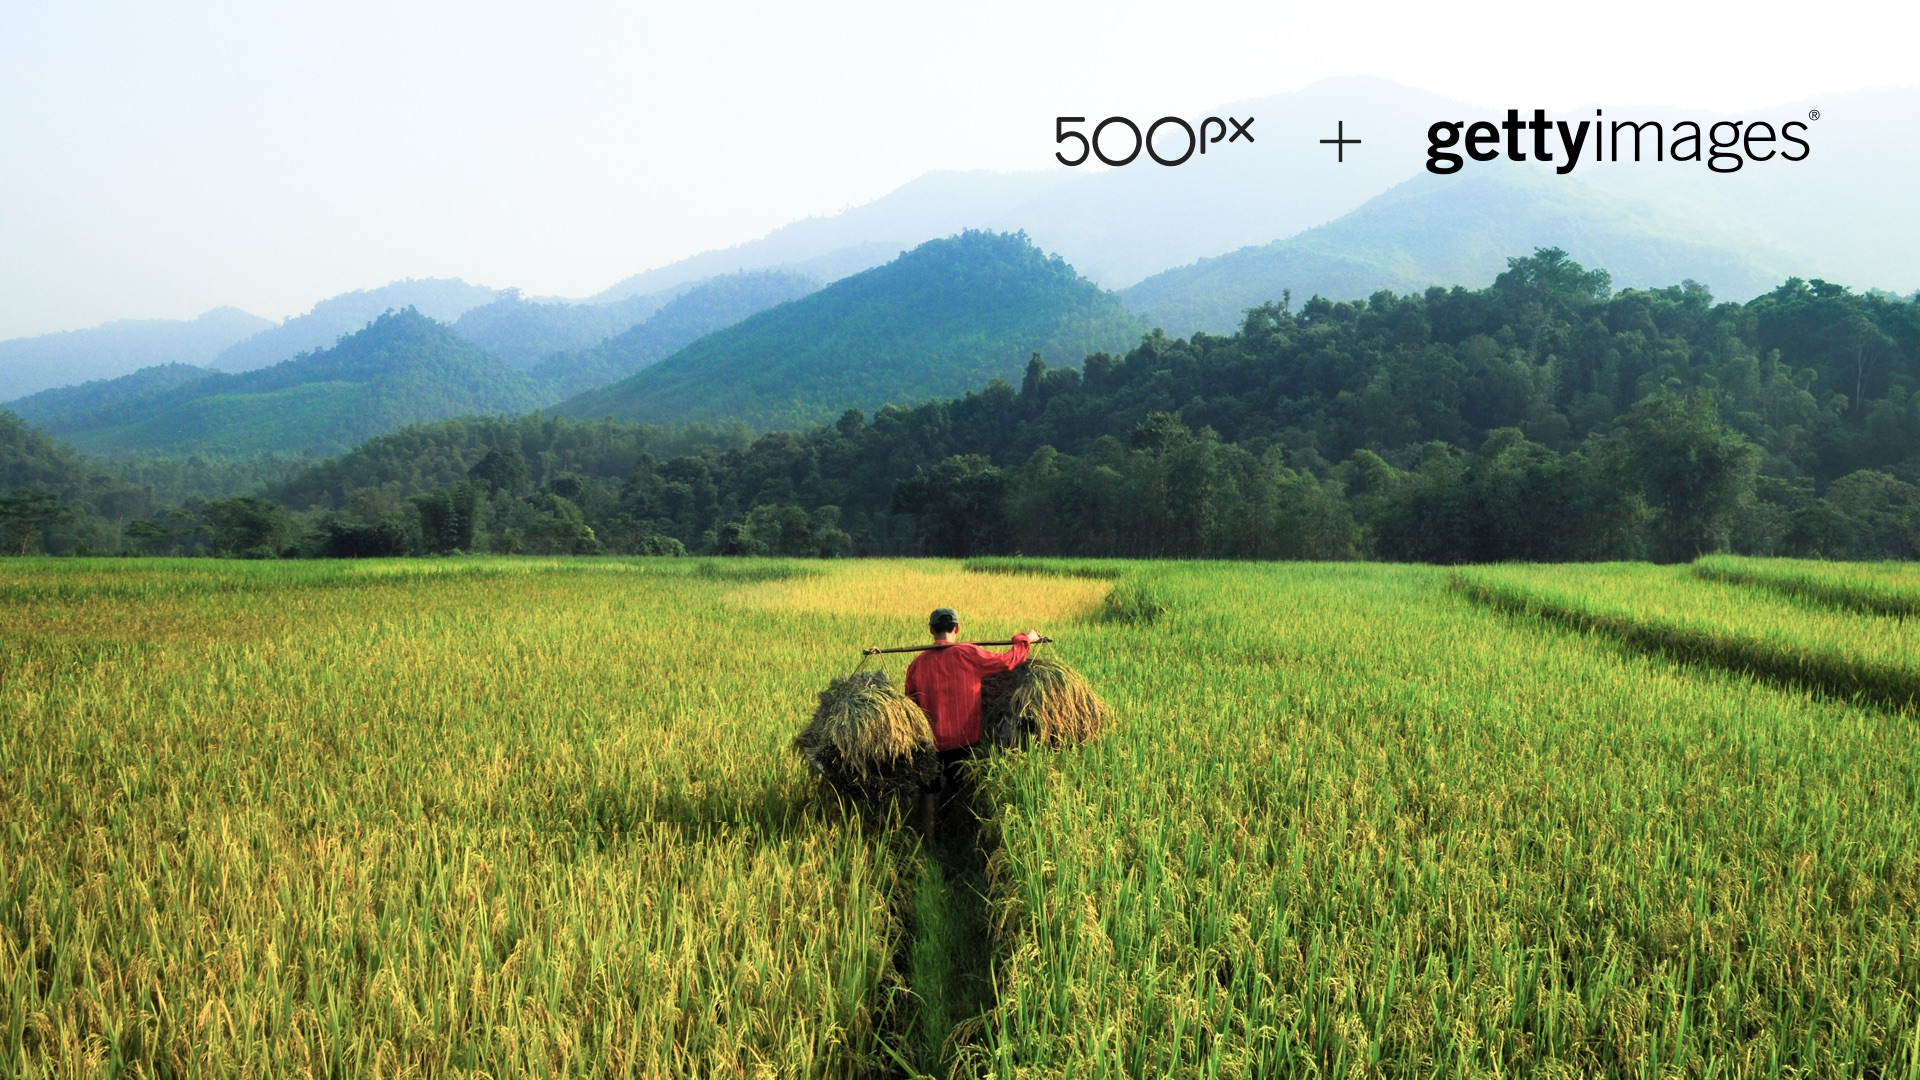 500px Blog » The passionate photographer community. » 5